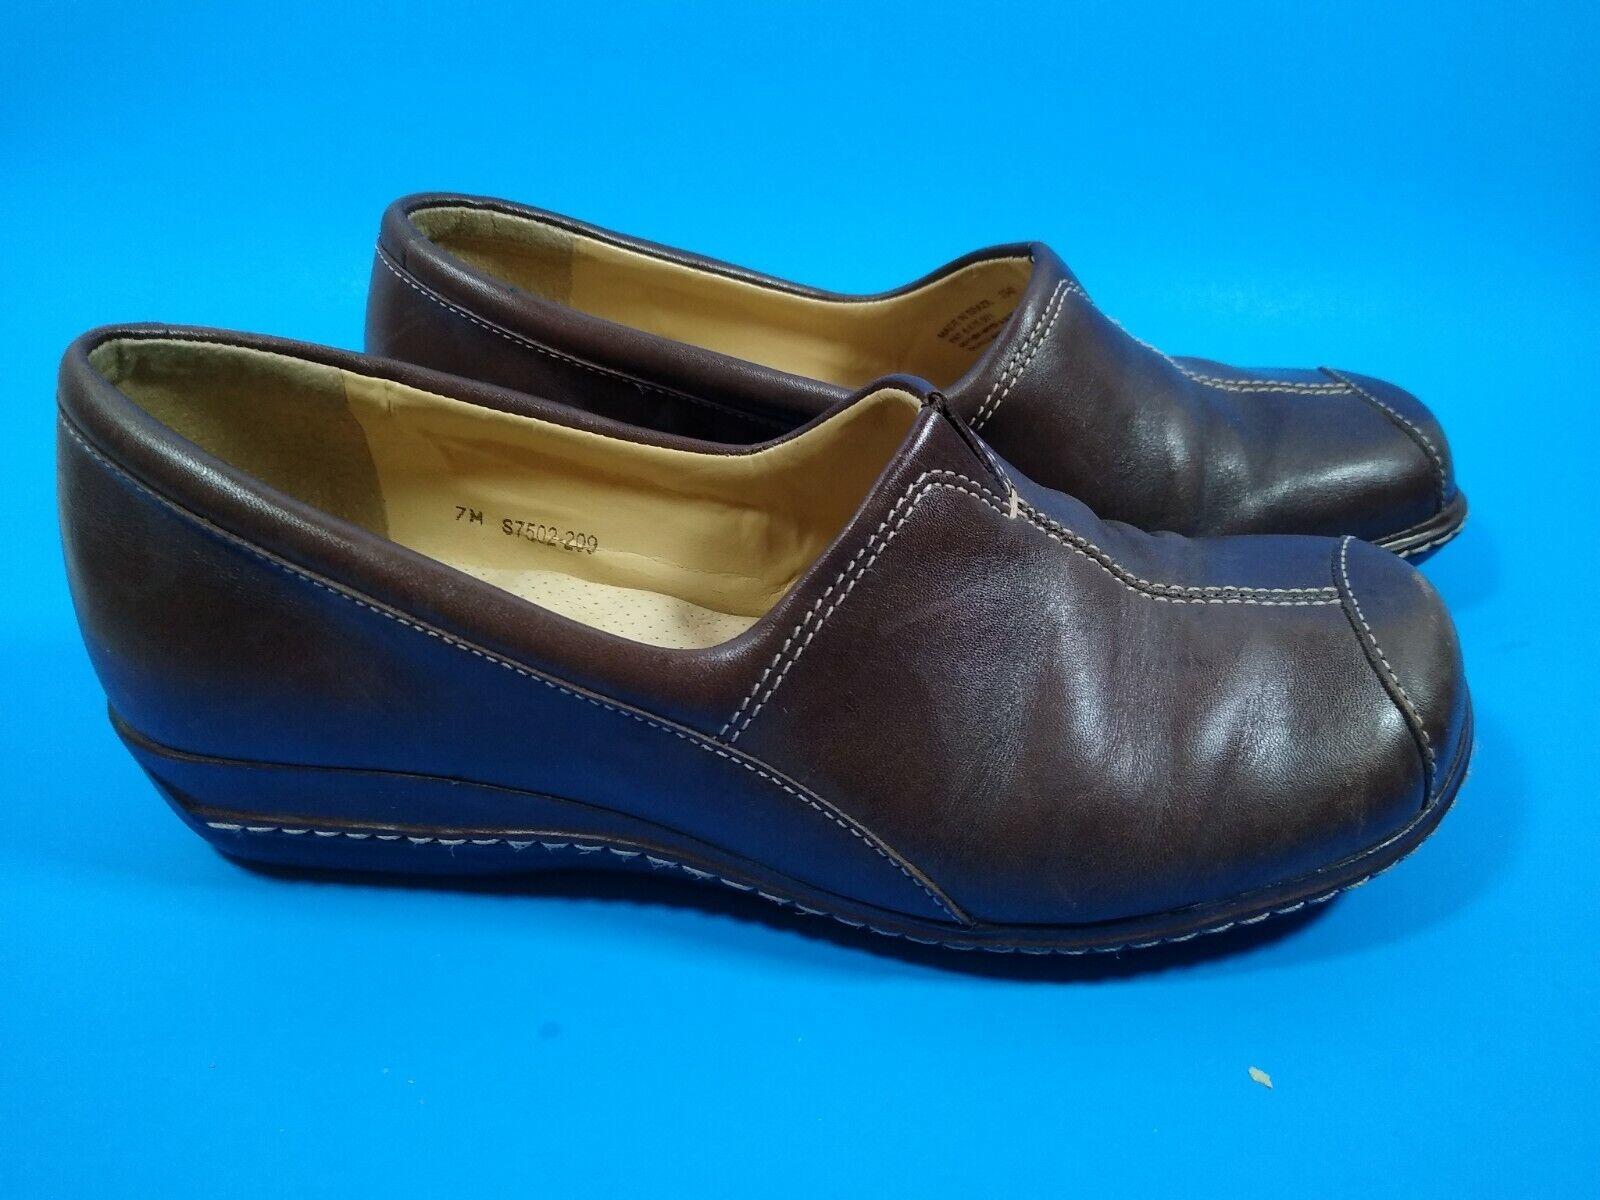 Soft Walk Women's Brown Leather Slip On S7502 Comfort Shoe size 7